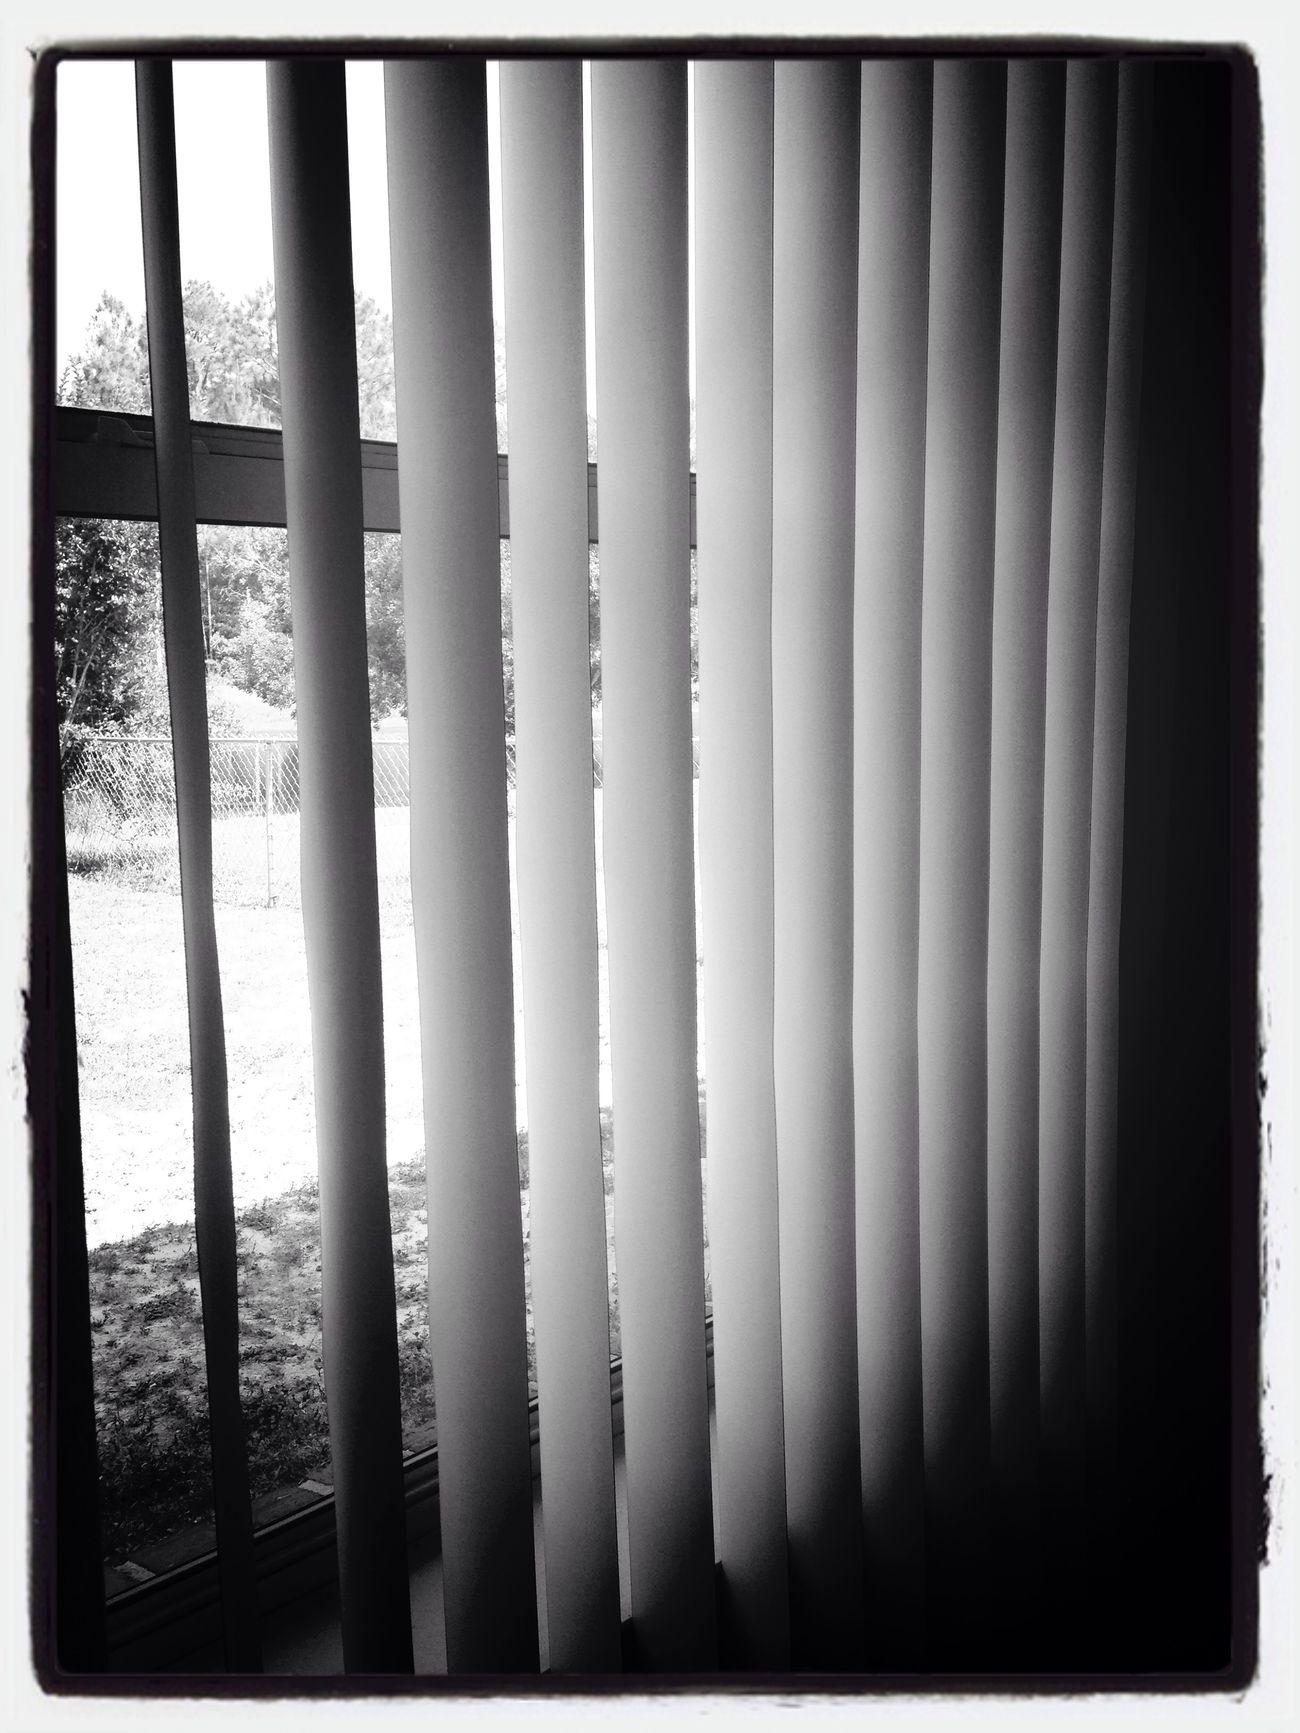 Looking outside